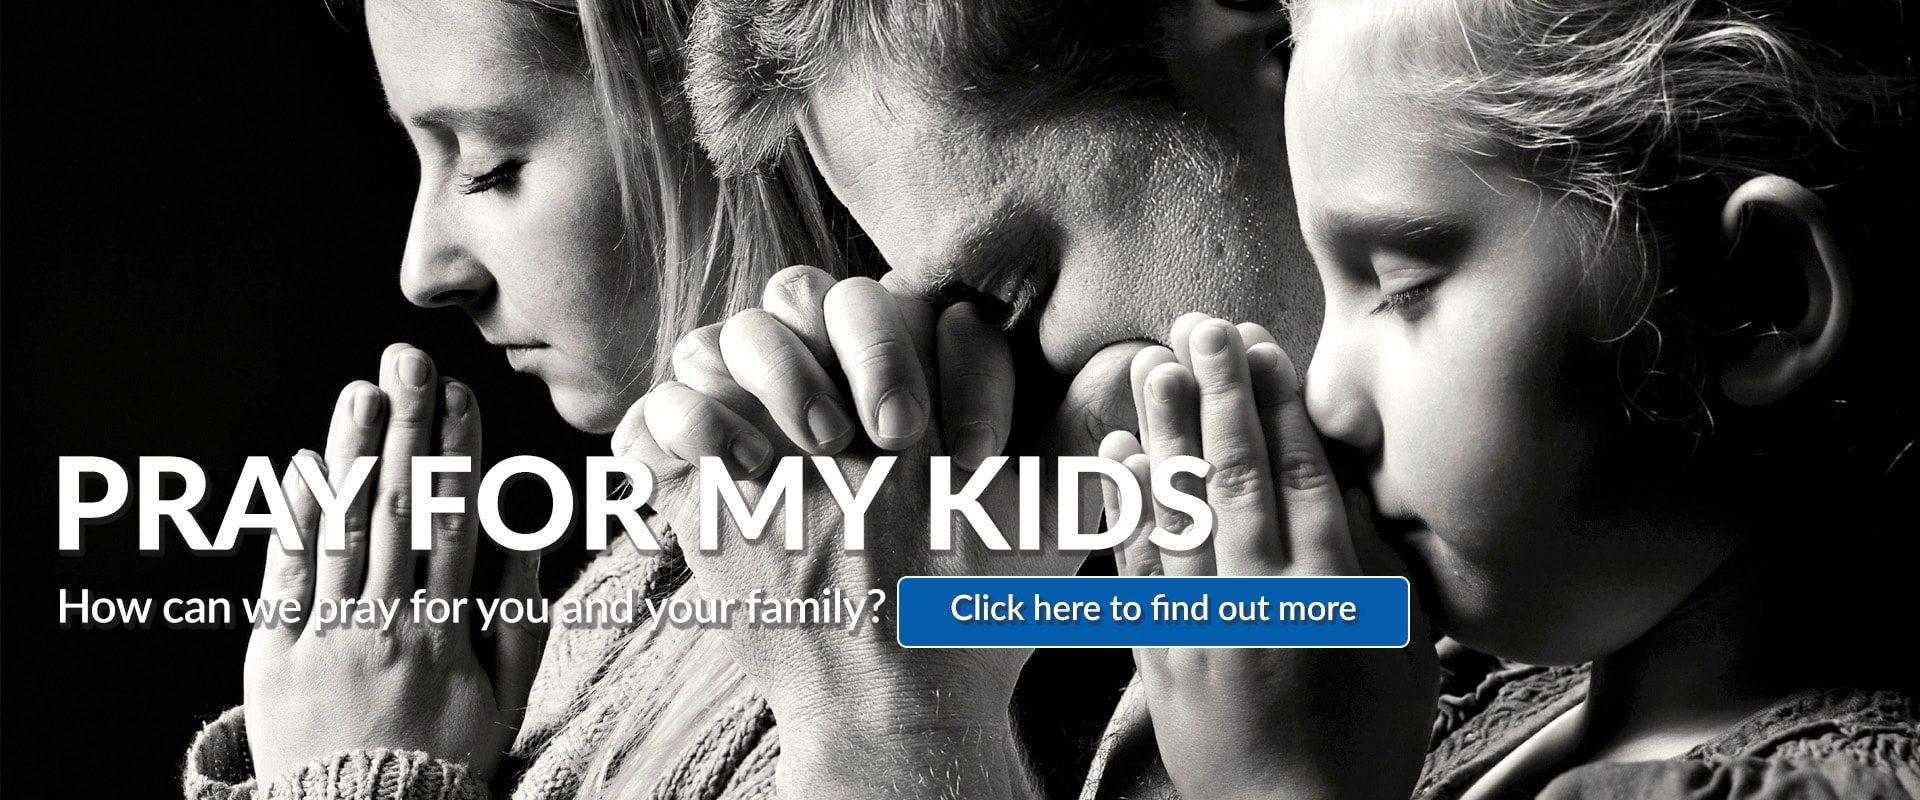 91.3 KGLY East Texas Christian Radio Pray for My Kids